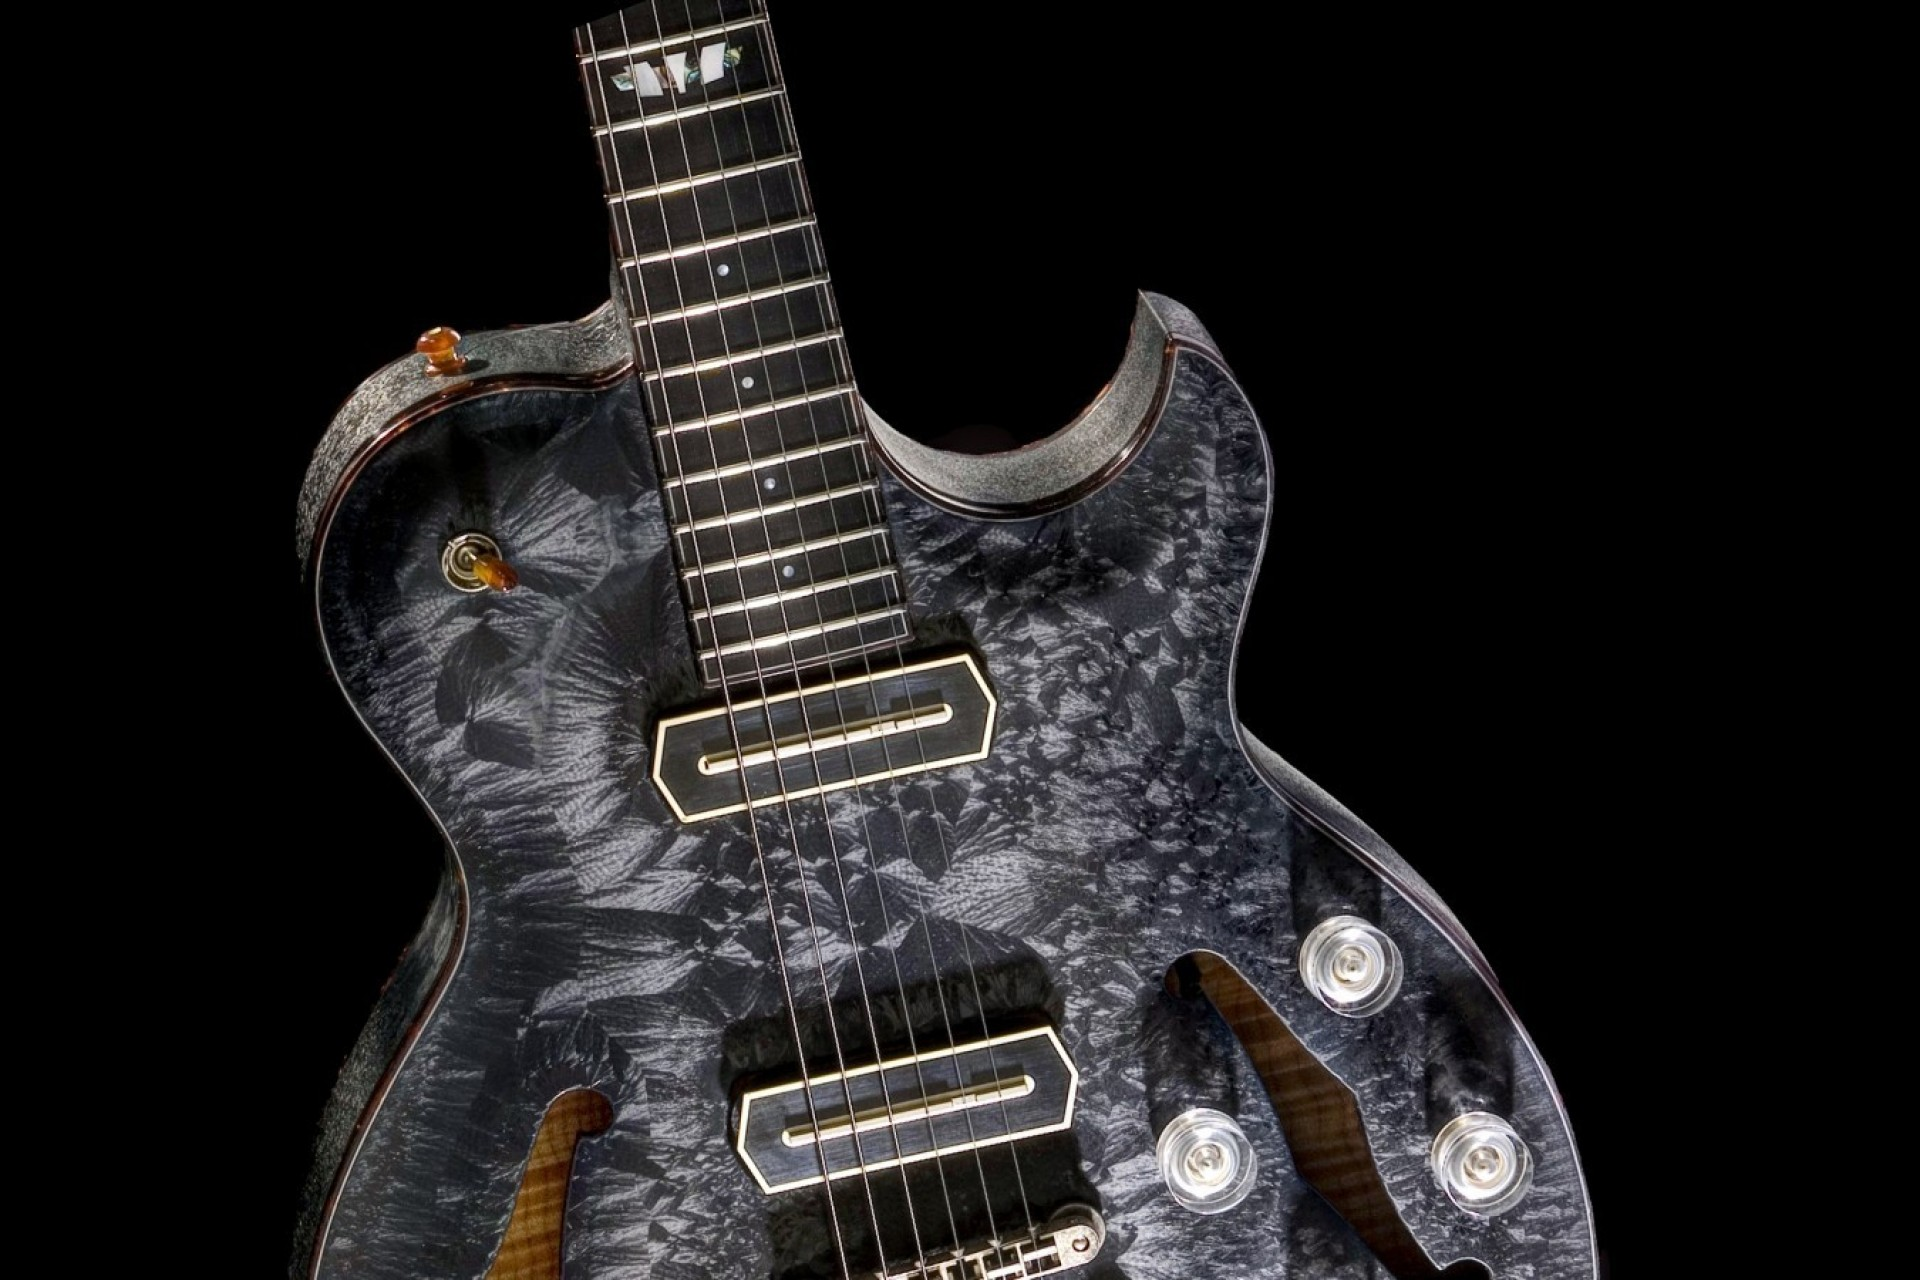 Custom Handmade Guitars By Jol Dantzig Of Character Fine Basses Electric Guitar Parts